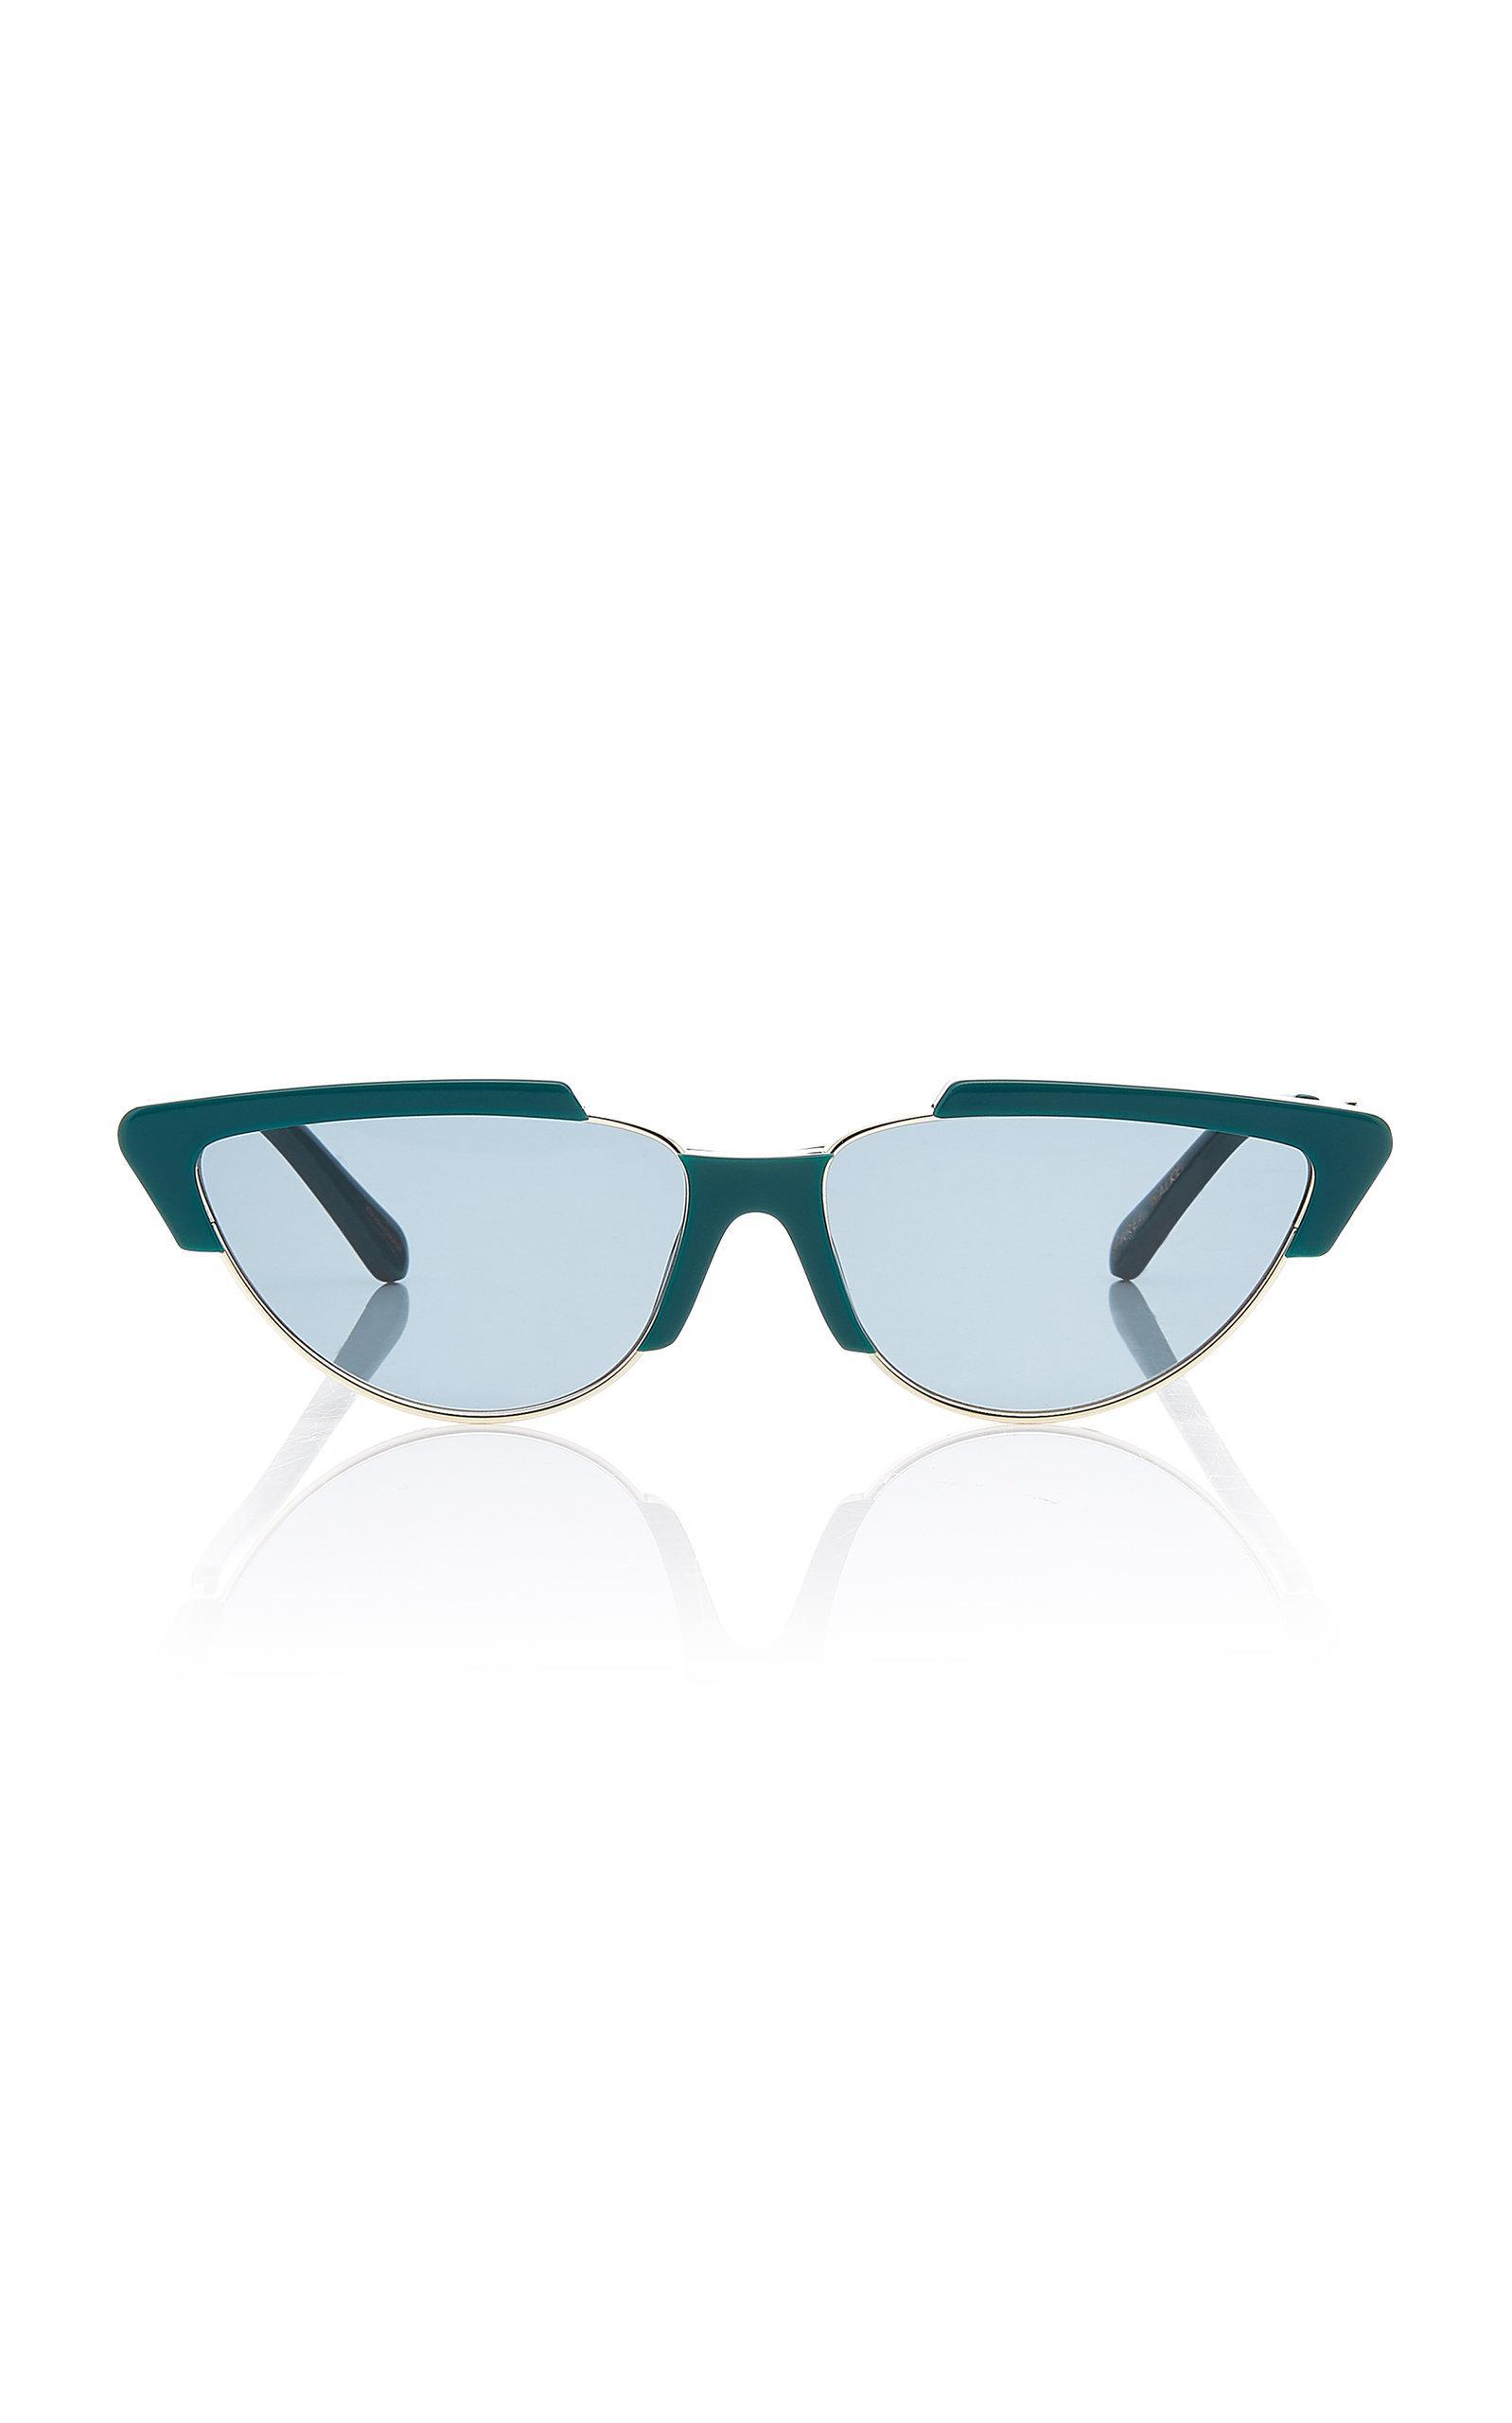 Tropics Cat Eye Acetate Sunglasses Karen Walker 24FNcNd2P